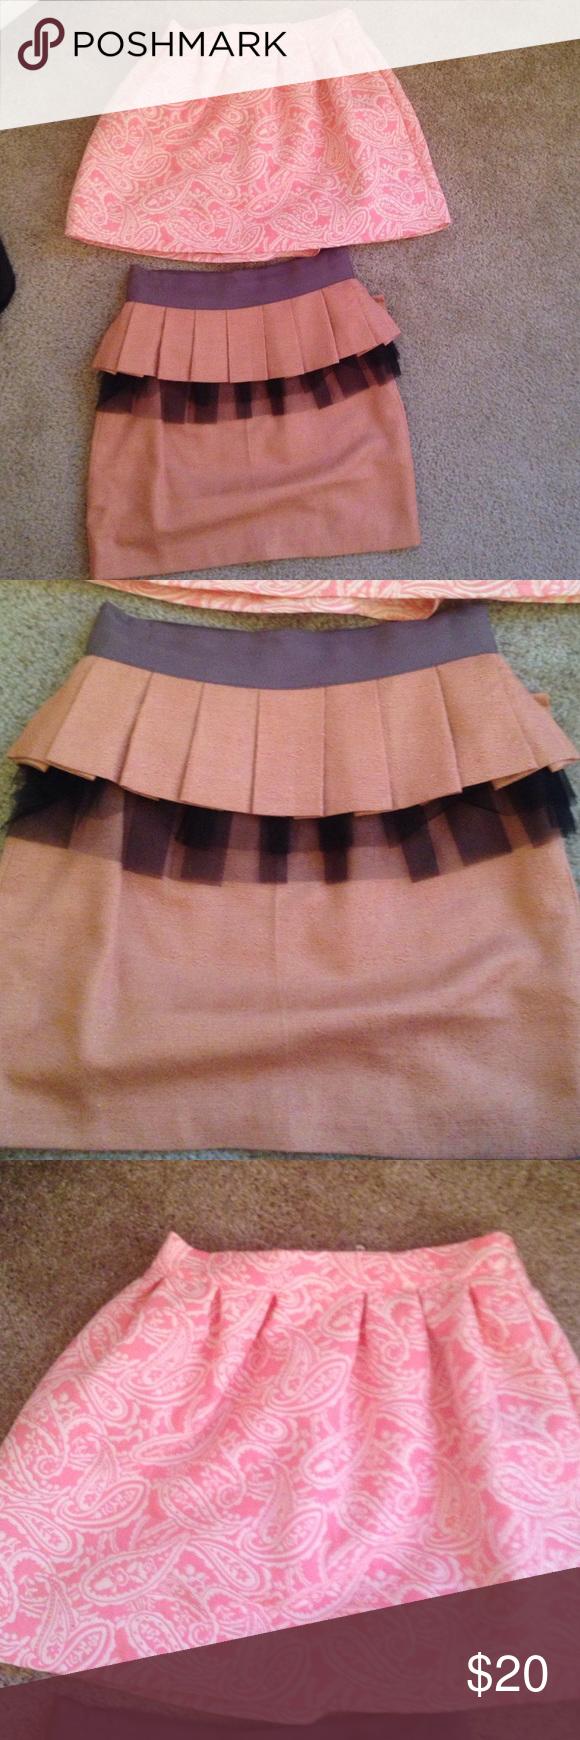 Forever 21 skirt and love culture Forever 21 skirt love culture skirt used great shape super cute (lot of 2) Forever 21 Skirts Mini